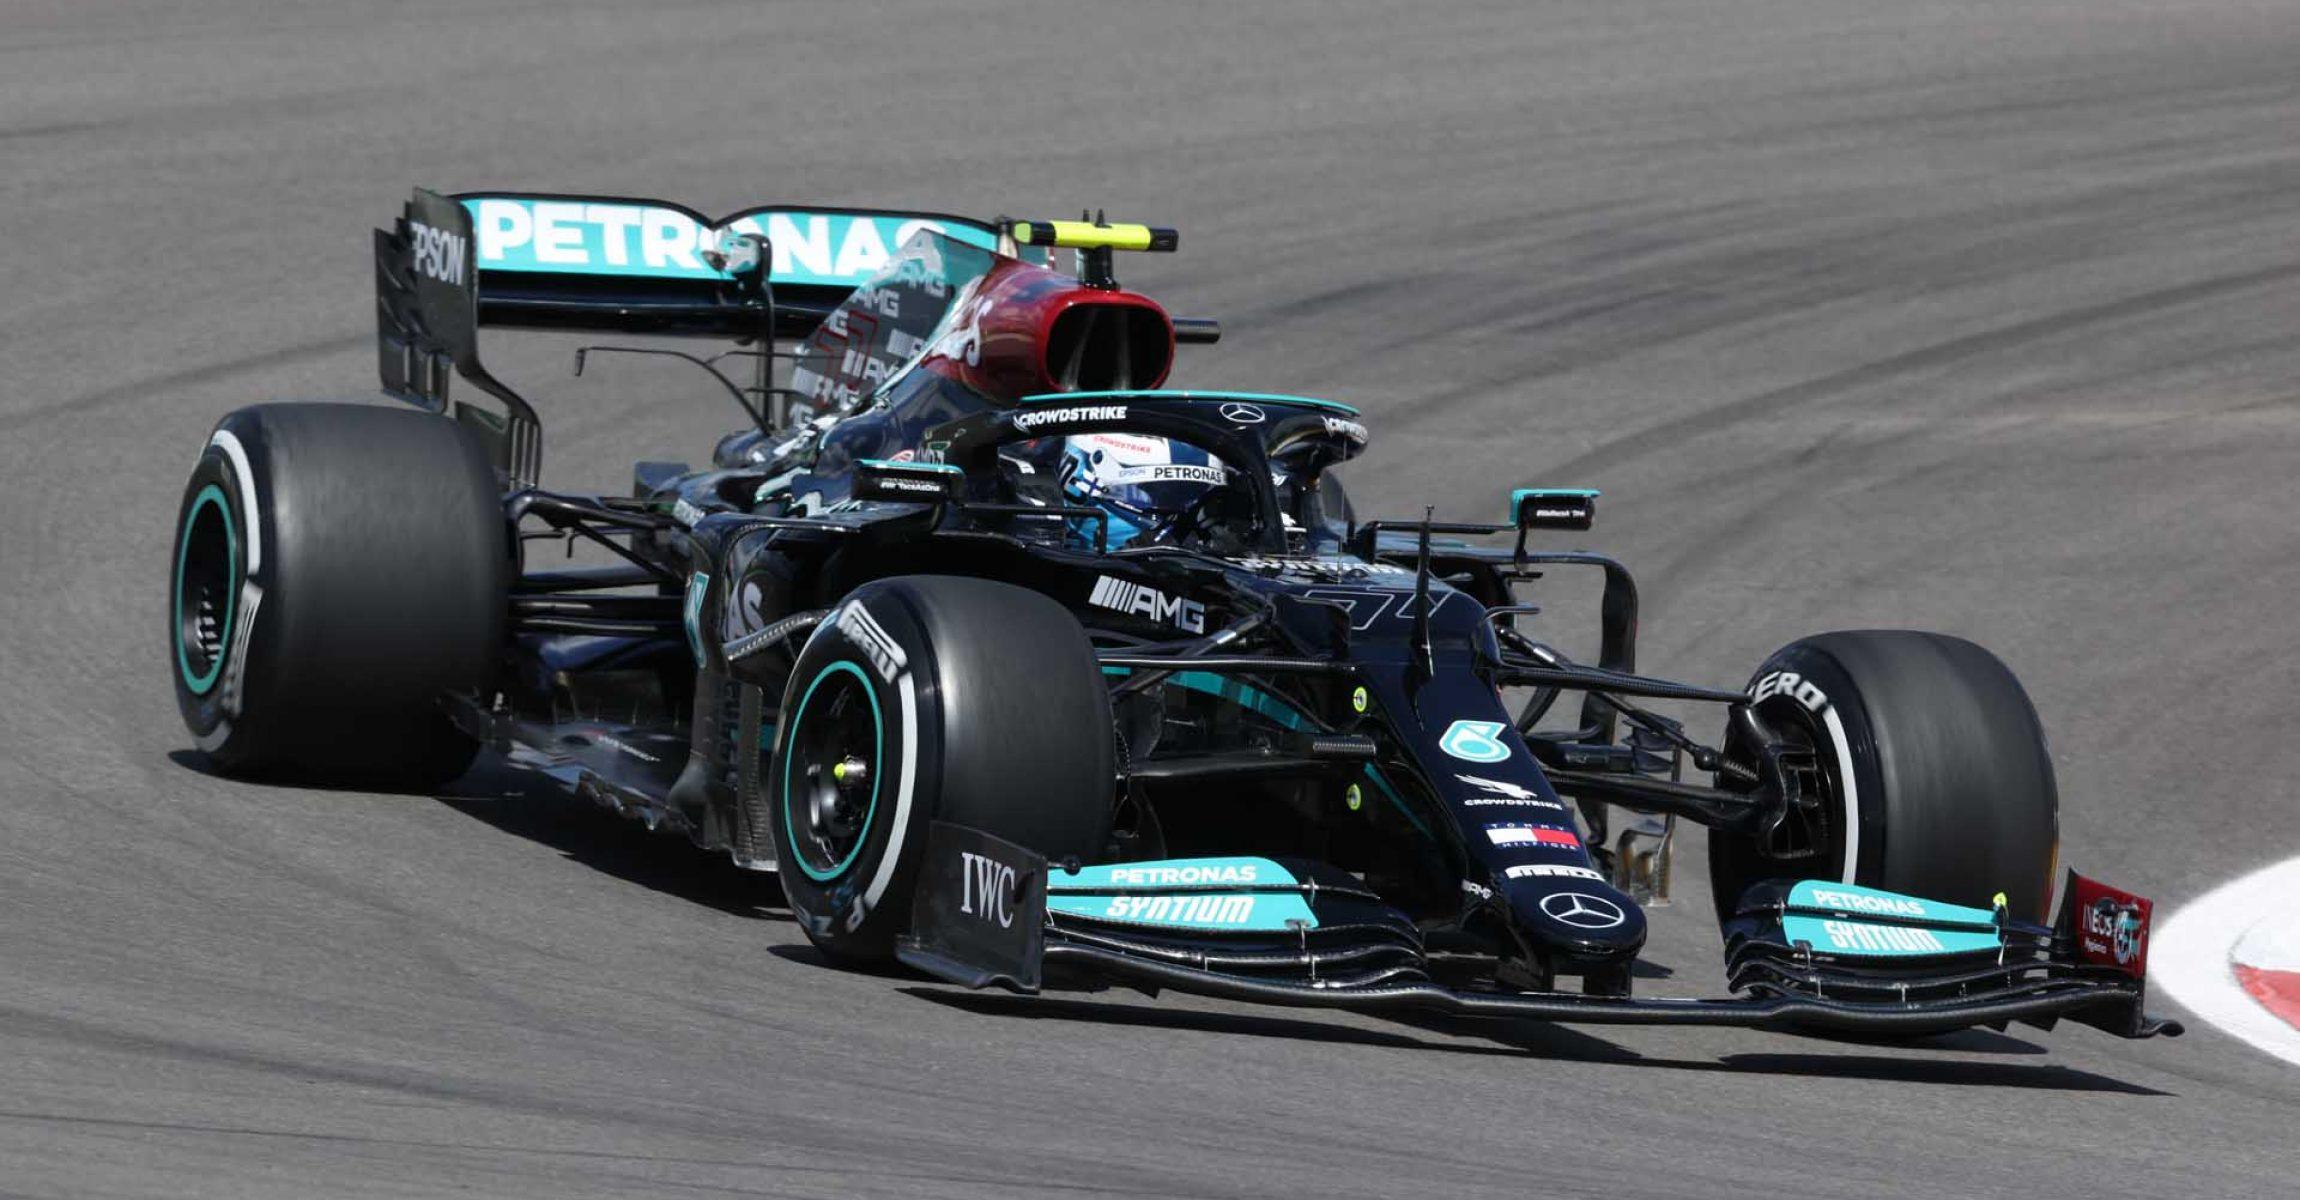 2021 Portuguese Grand Prix, Friday - Wolfgang Wilhelm Valtteri Bottas Mercedes